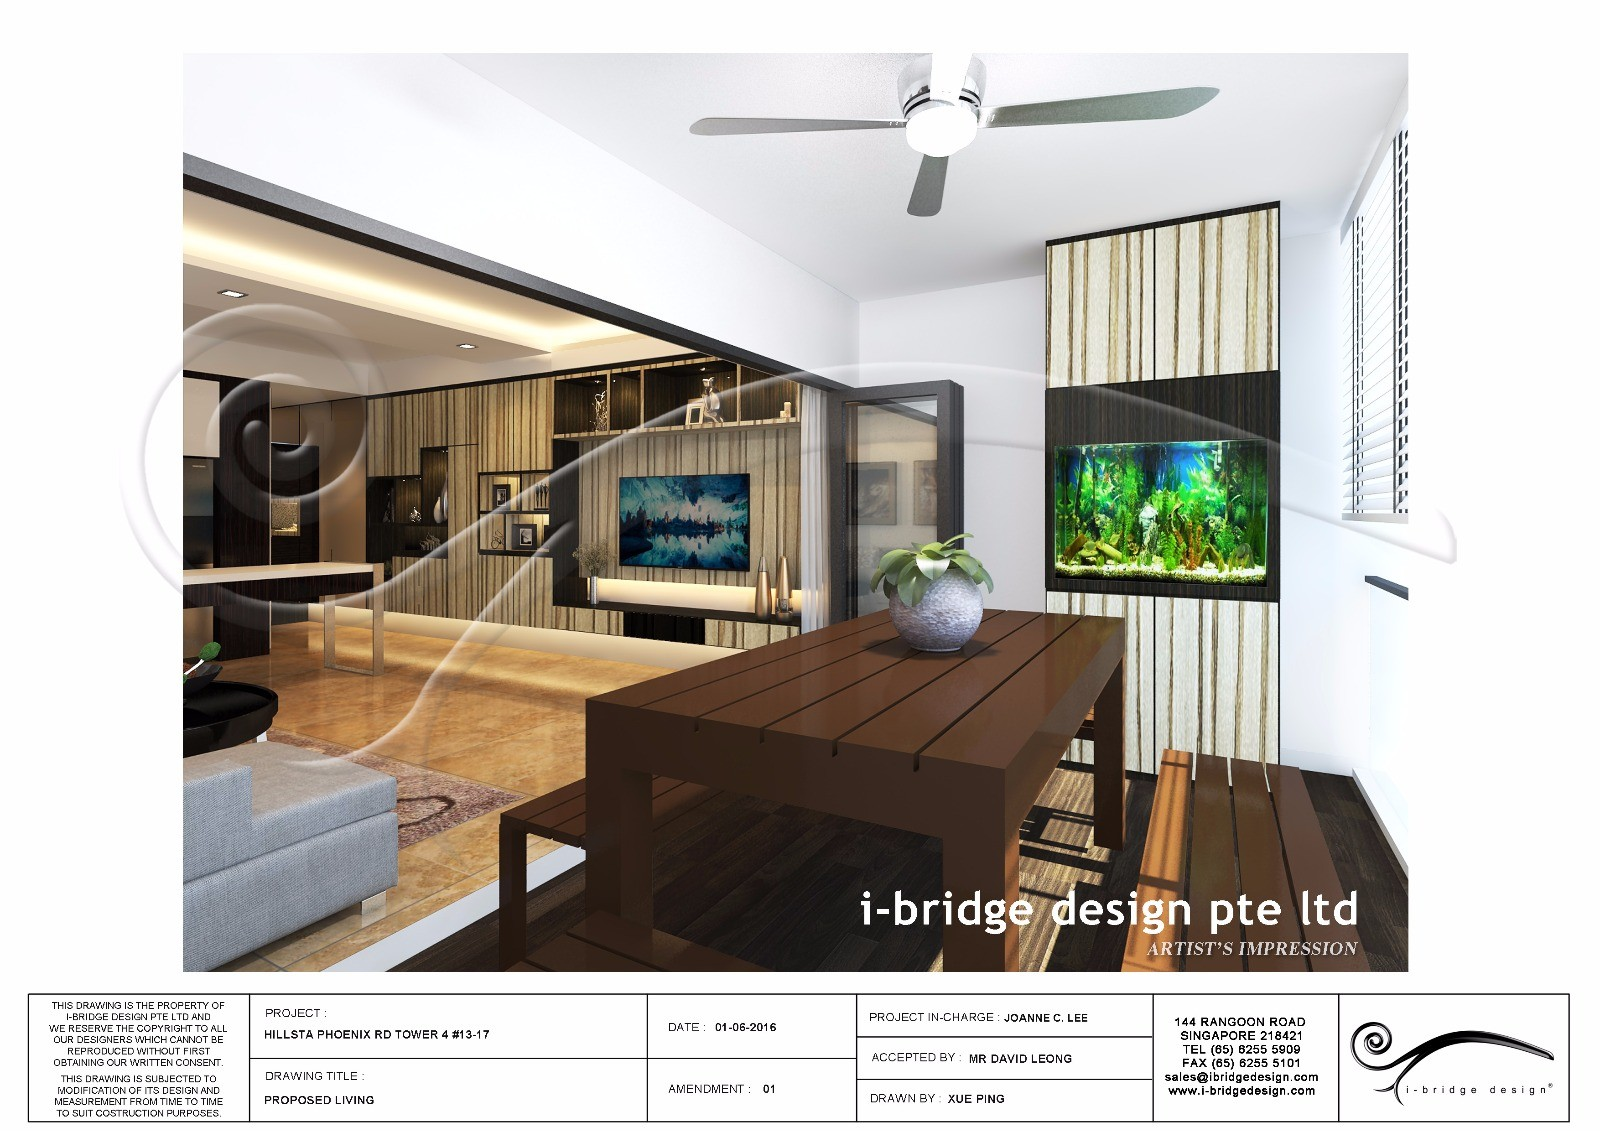 First Dot Design Pte Ltd - UPDATED Aug 2019 Singapore